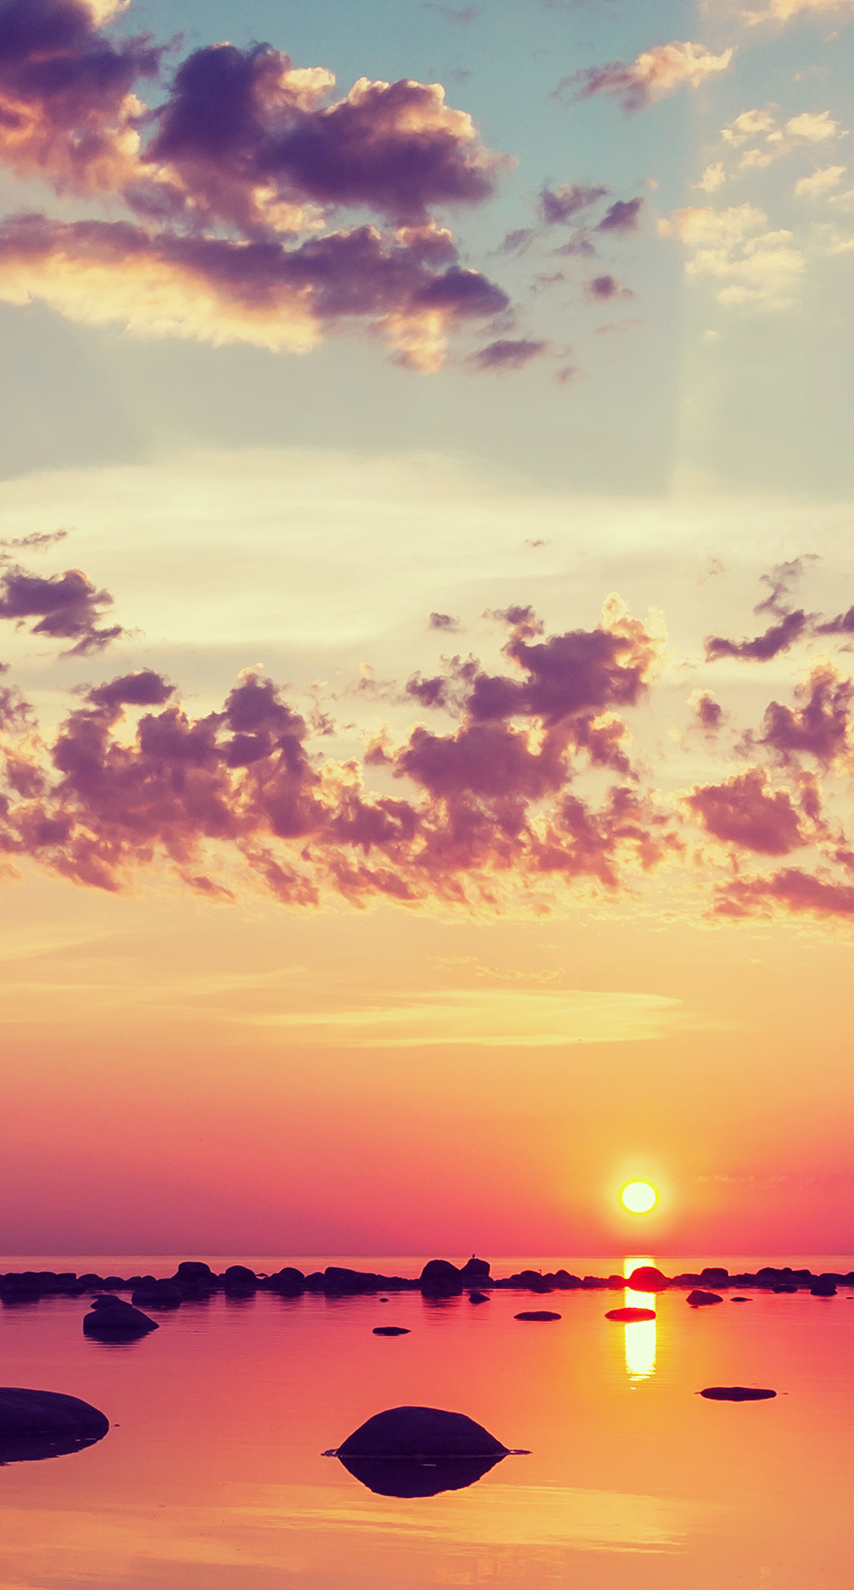 calm, sunlight